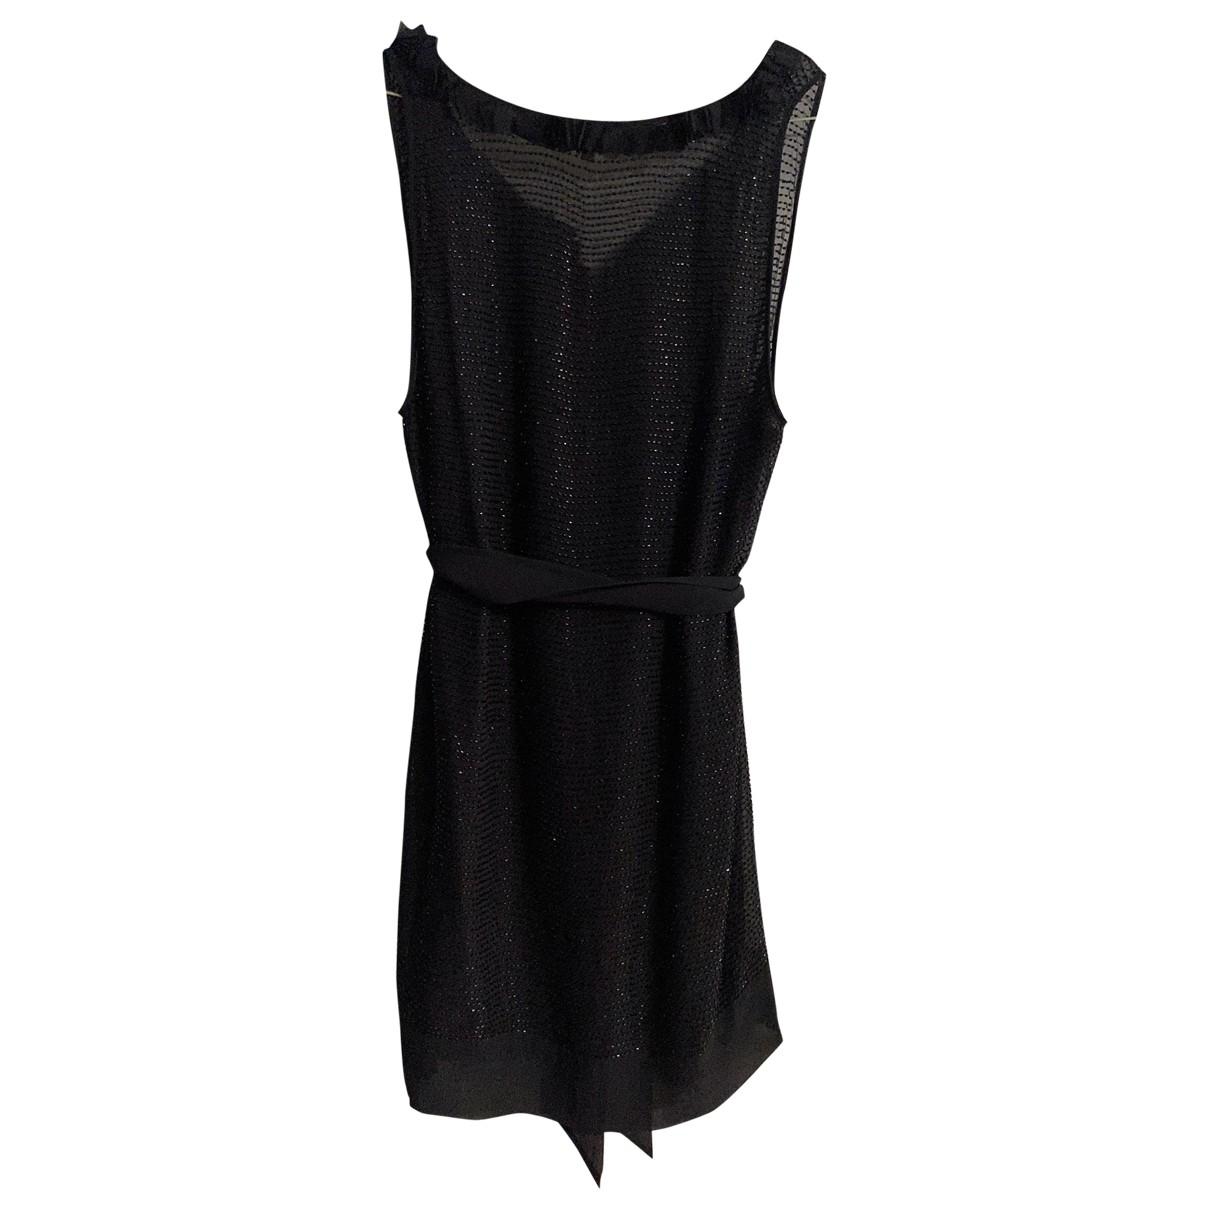 Bcbg Max Azria \N Black Silk dress for Women 36 FR